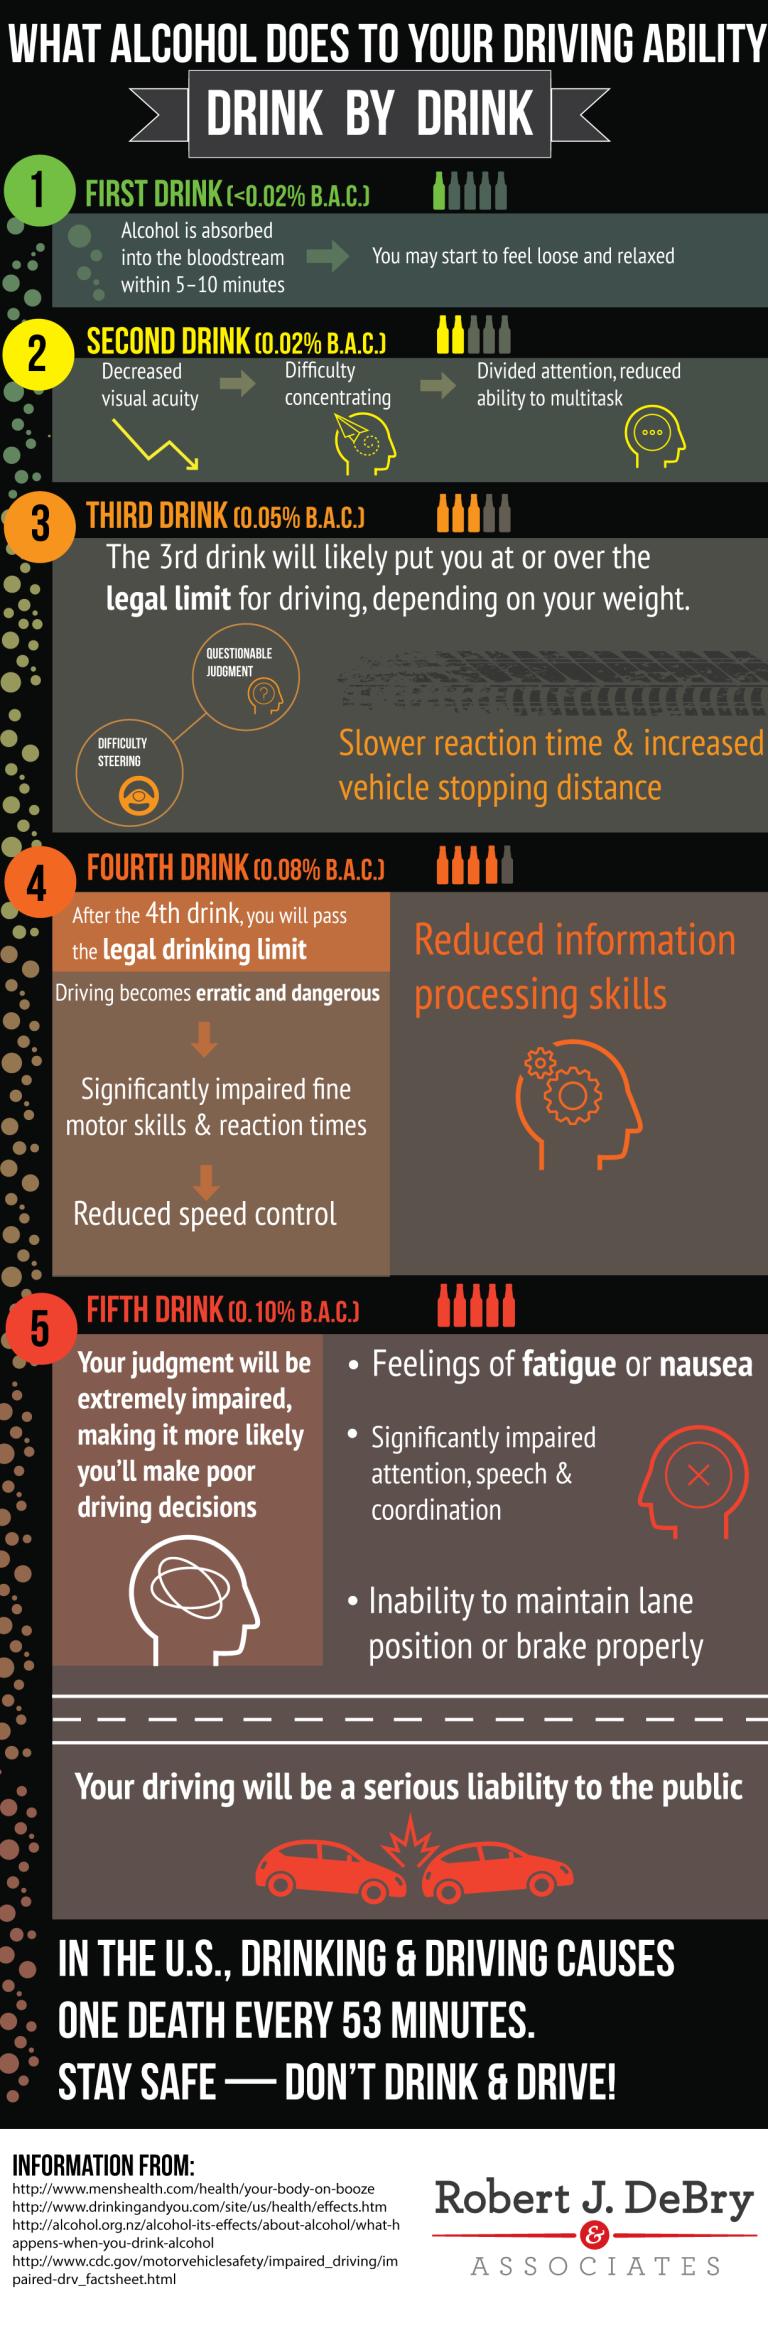 alcoholdrivingability